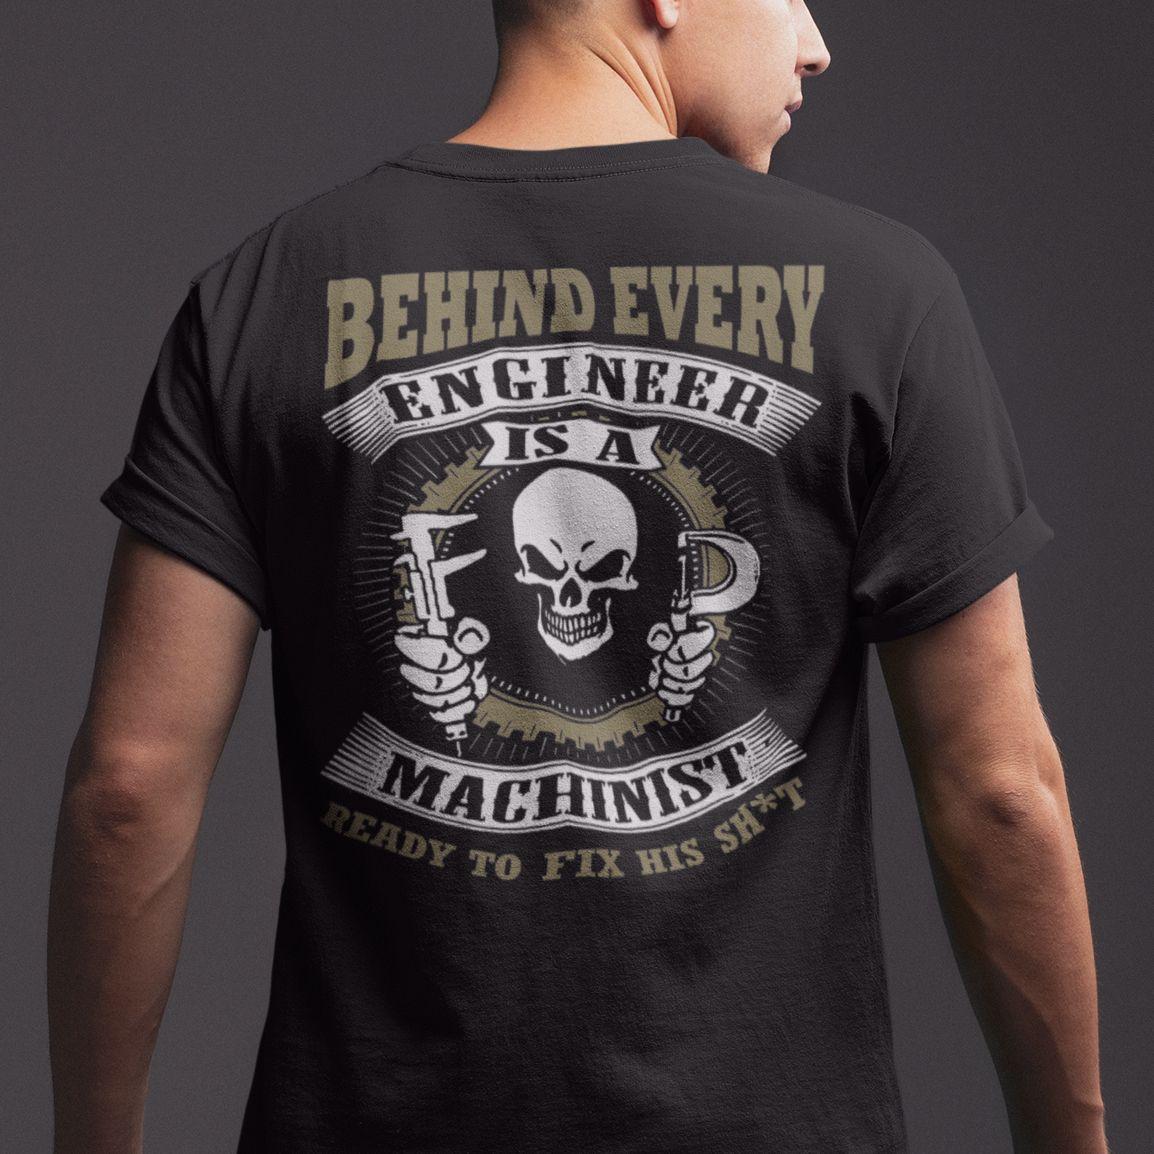 Machinist Because Engineers Need Heroes Gildan Tee T-Shirt Cotton Crew neck